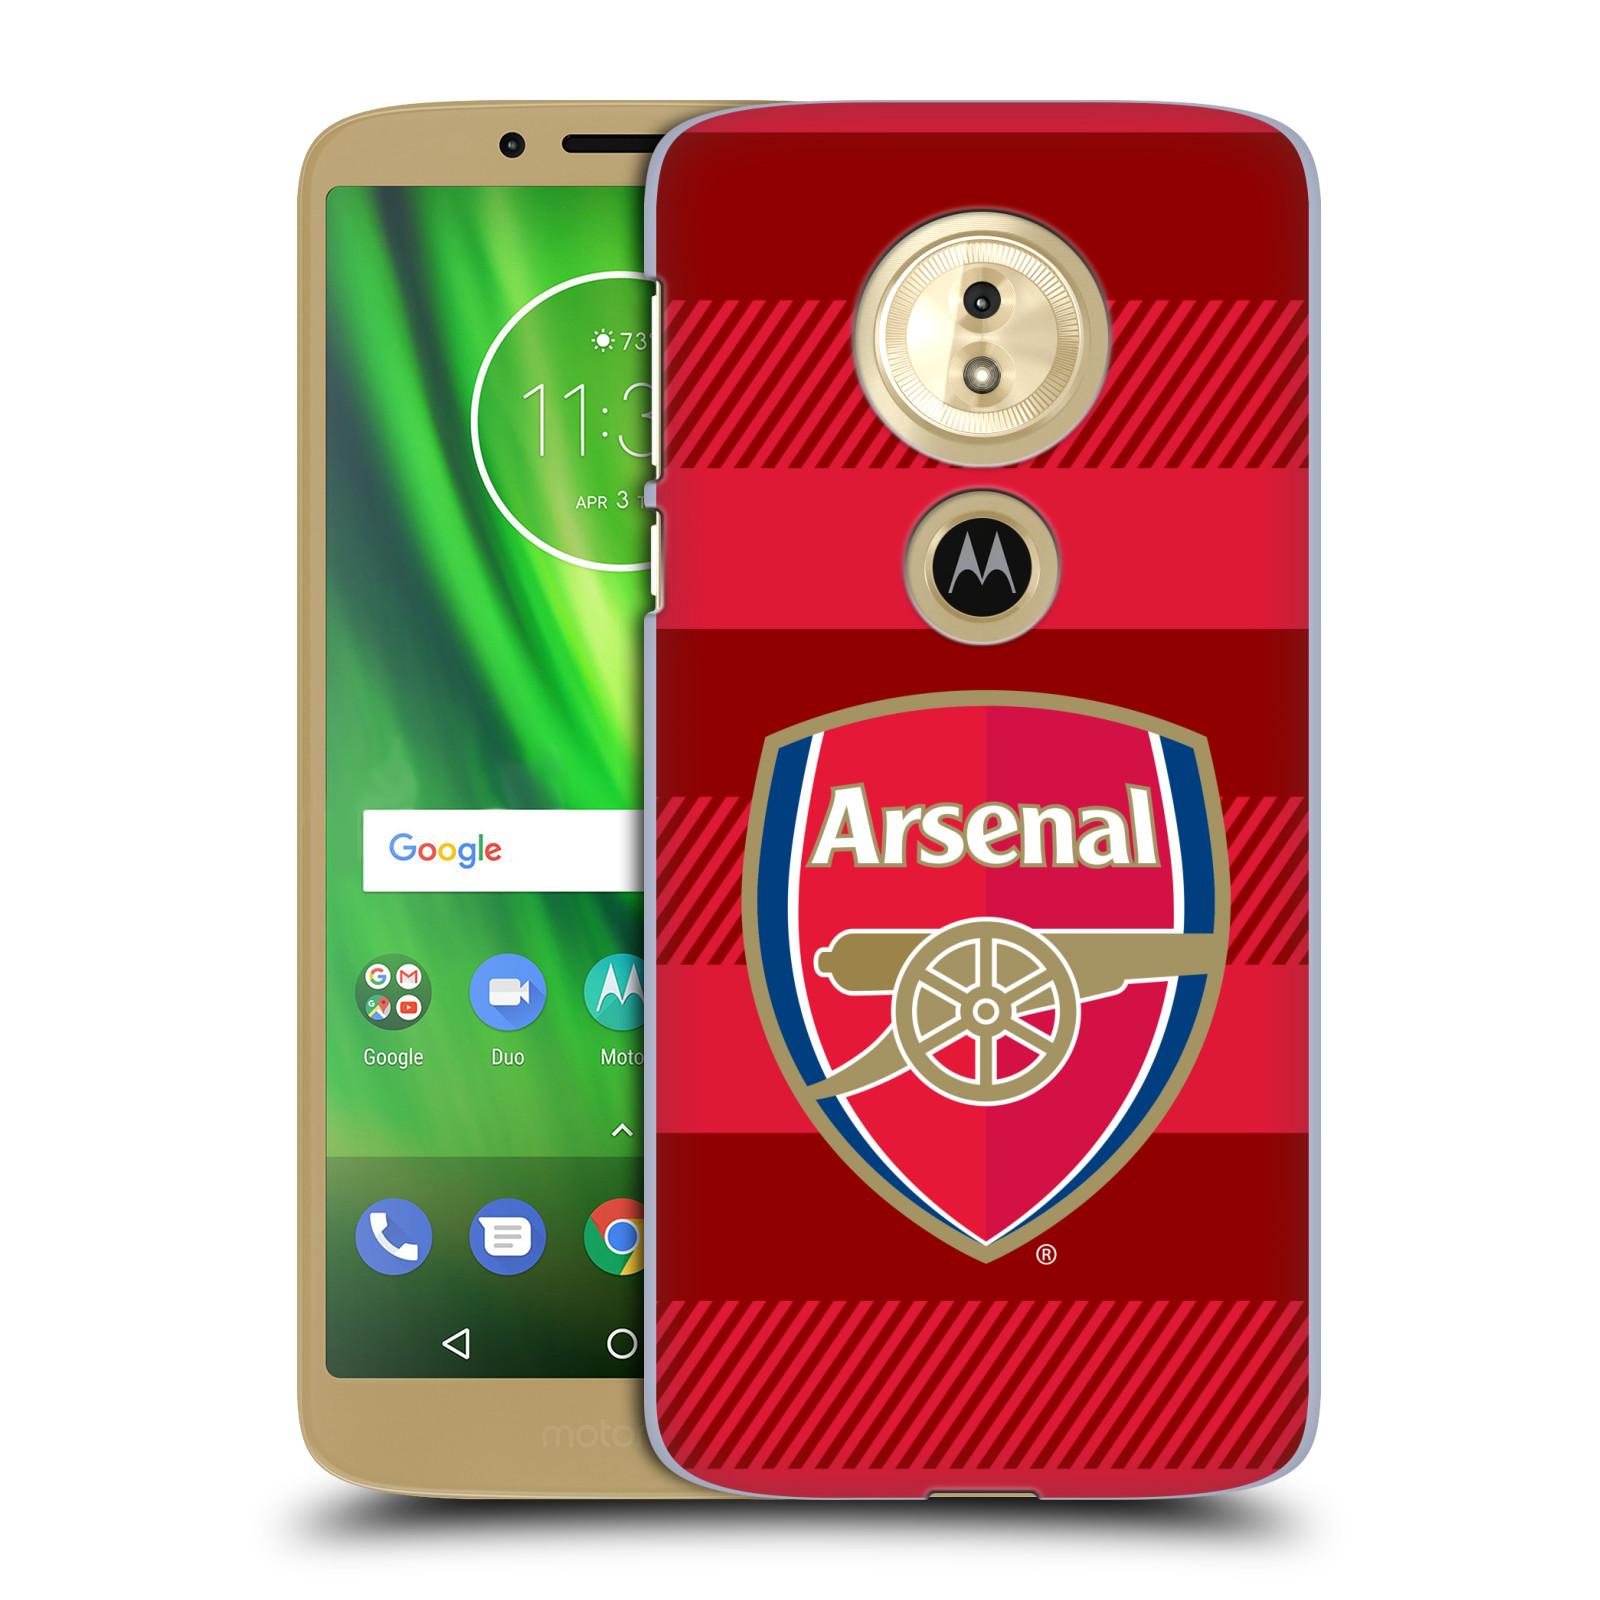 Plastové pouzdro na mobil Motorola Moto G6 Play - Head Case - Arsenal FC - Logo s pruhy